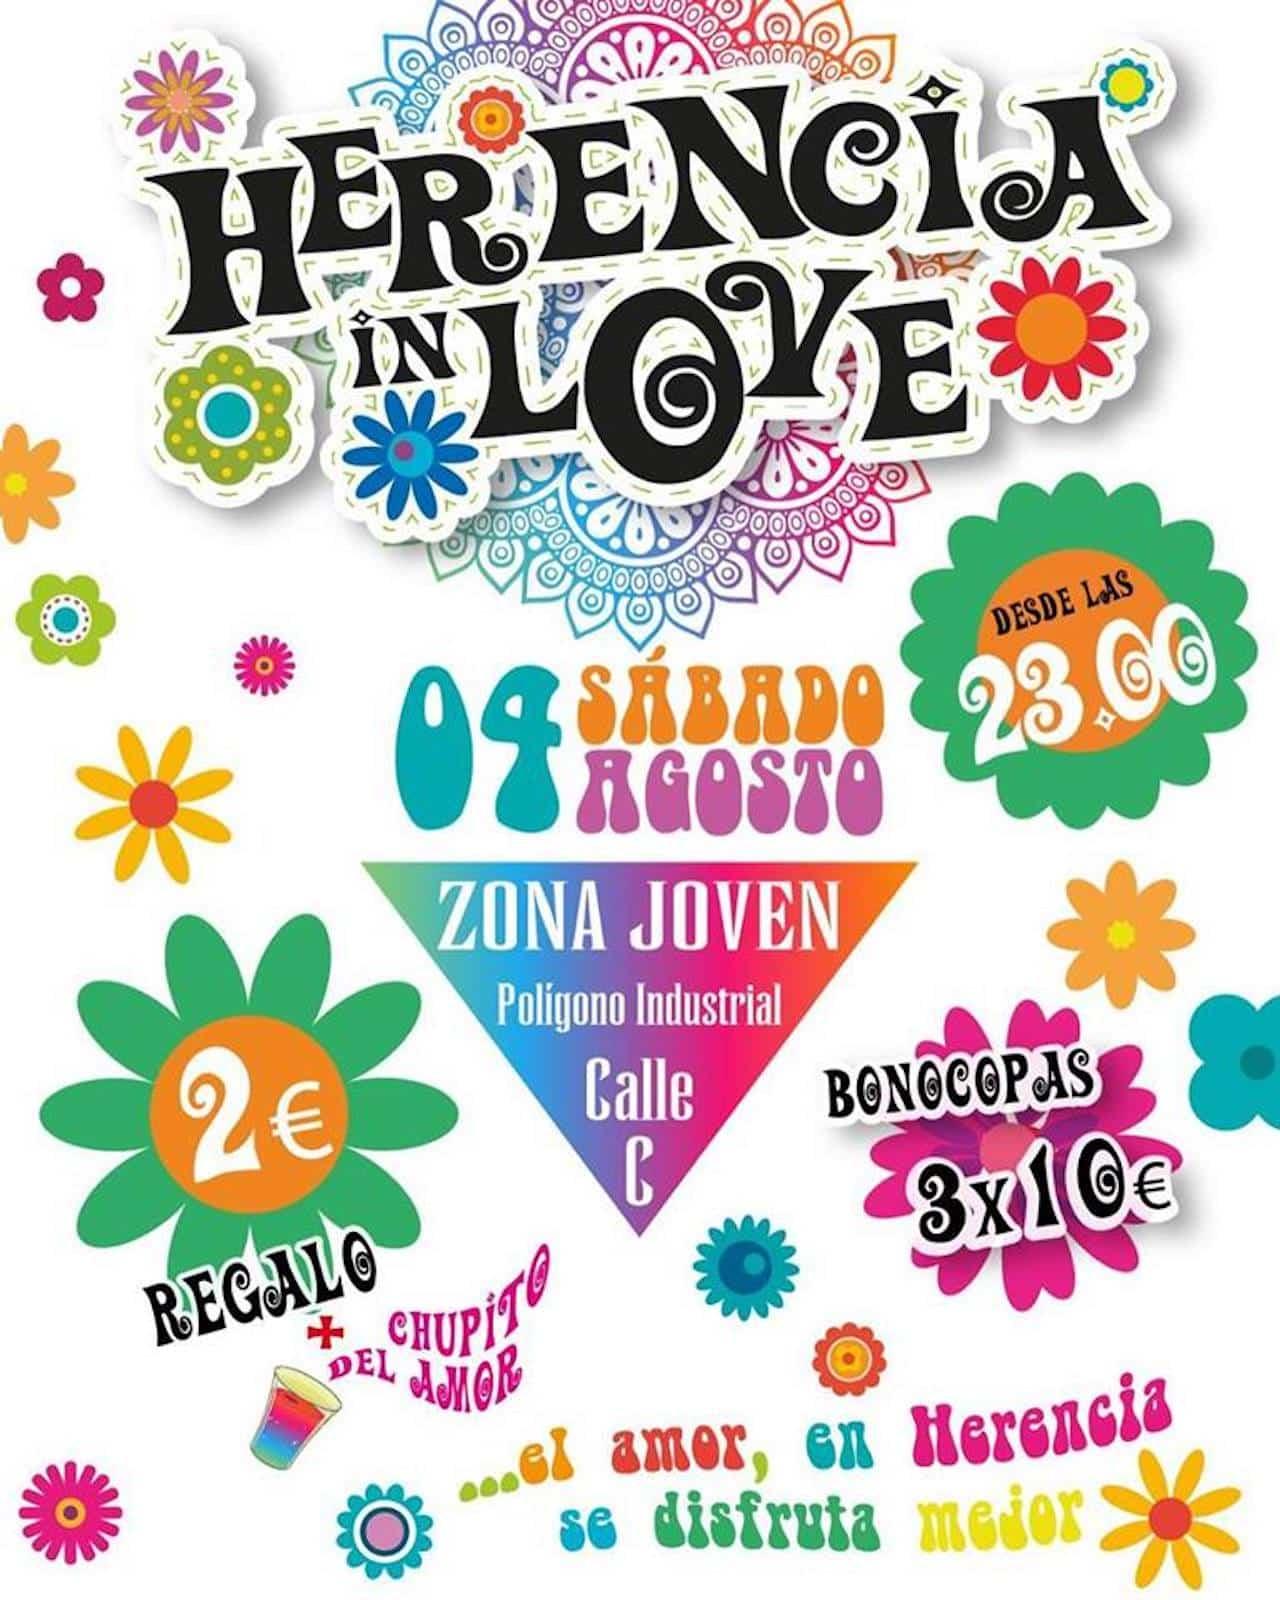 "fiesta botellon herencia in love - Fiesta ""Herencia in love"" este fin de semana en Herencia"